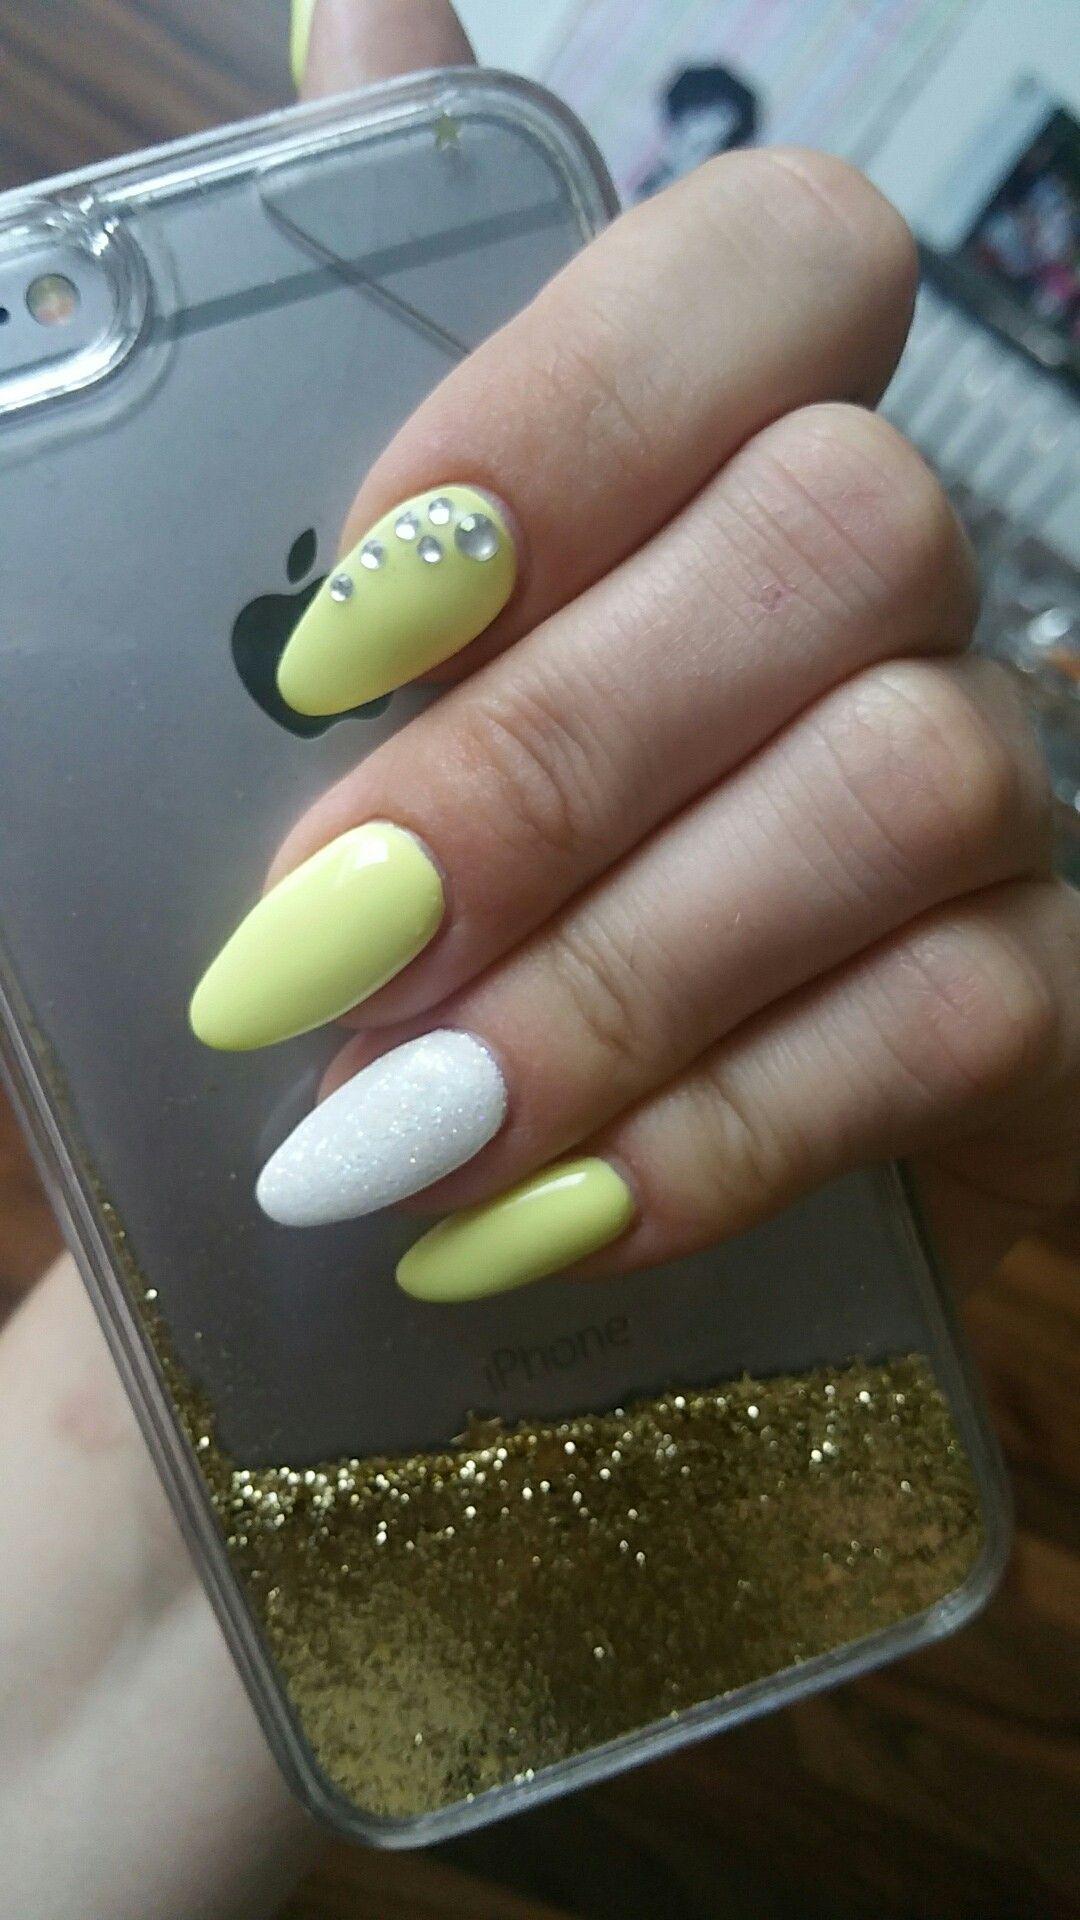 Ongles gel jaune blanc été